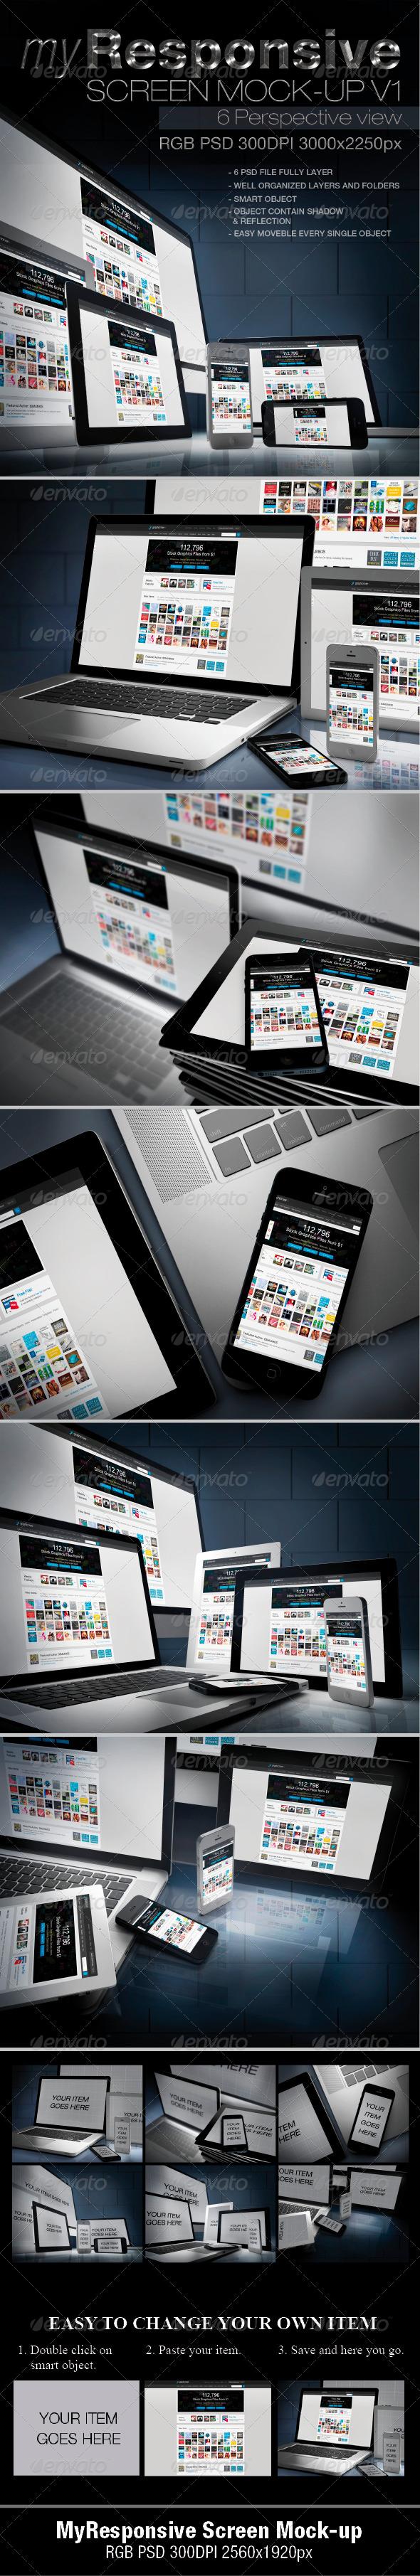 GraphicRiver myResponsive screen mock-up 4665262